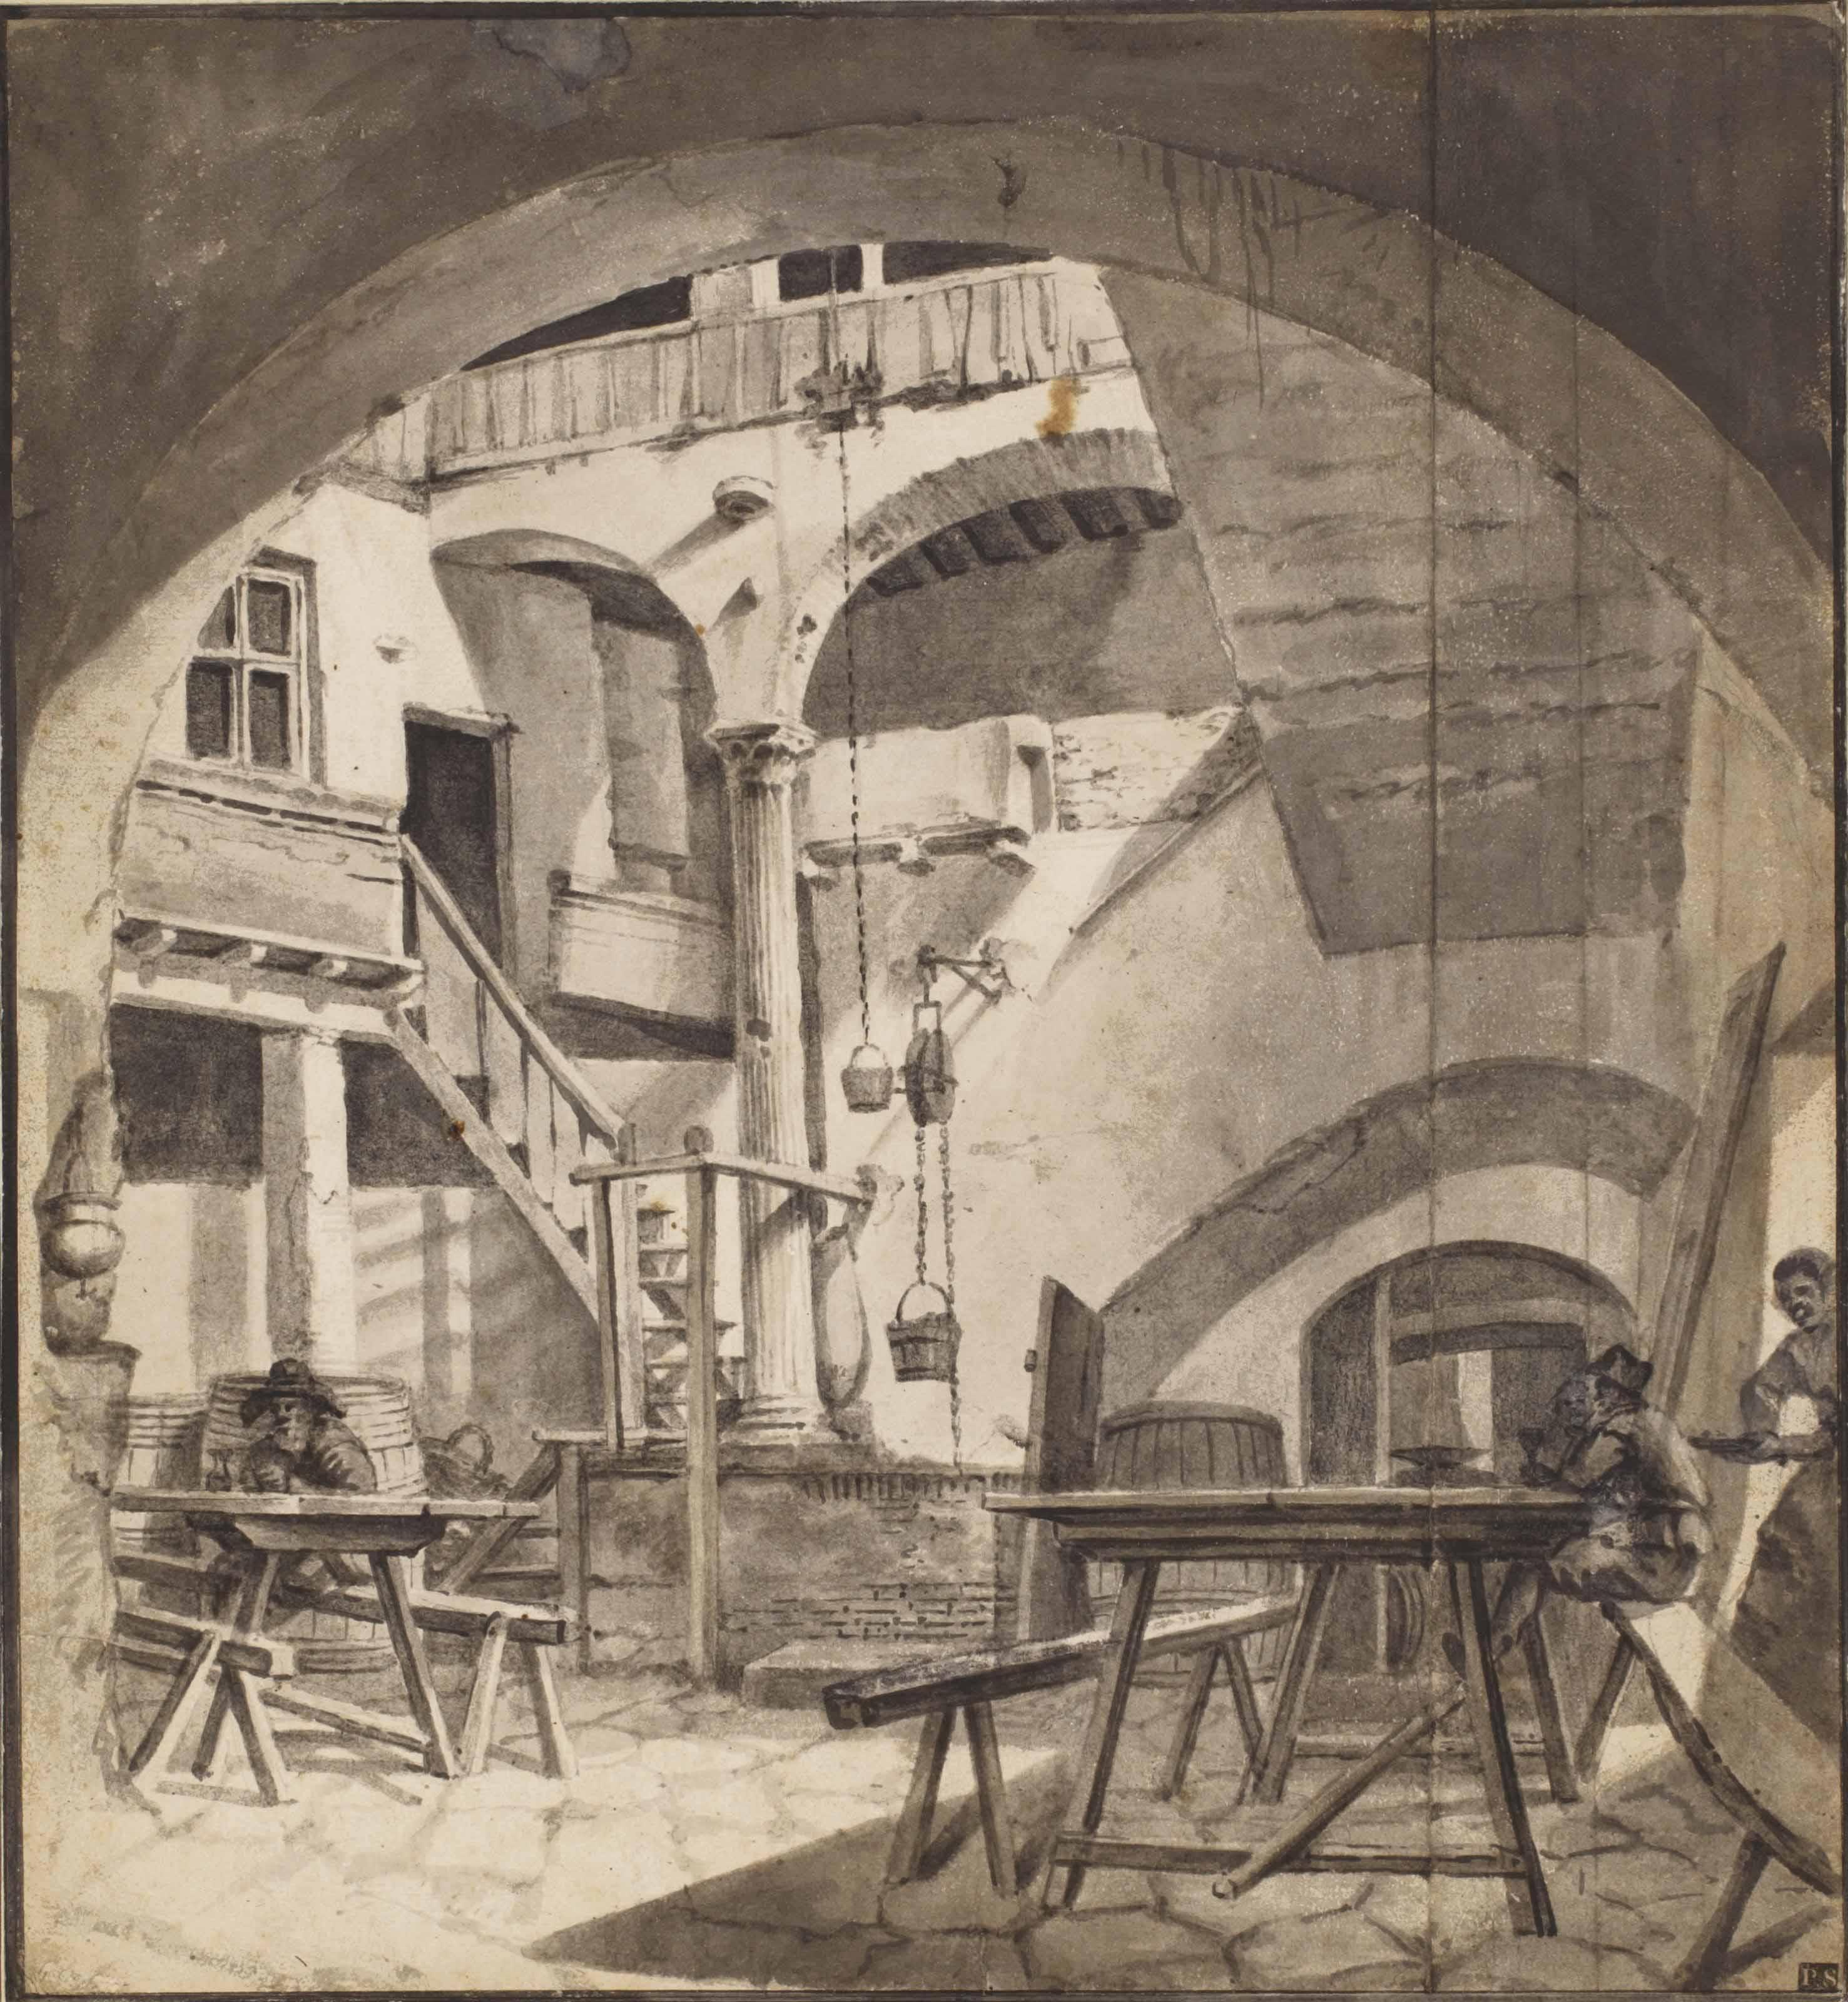 The courtyard of an Italian house, perhaps a tavern